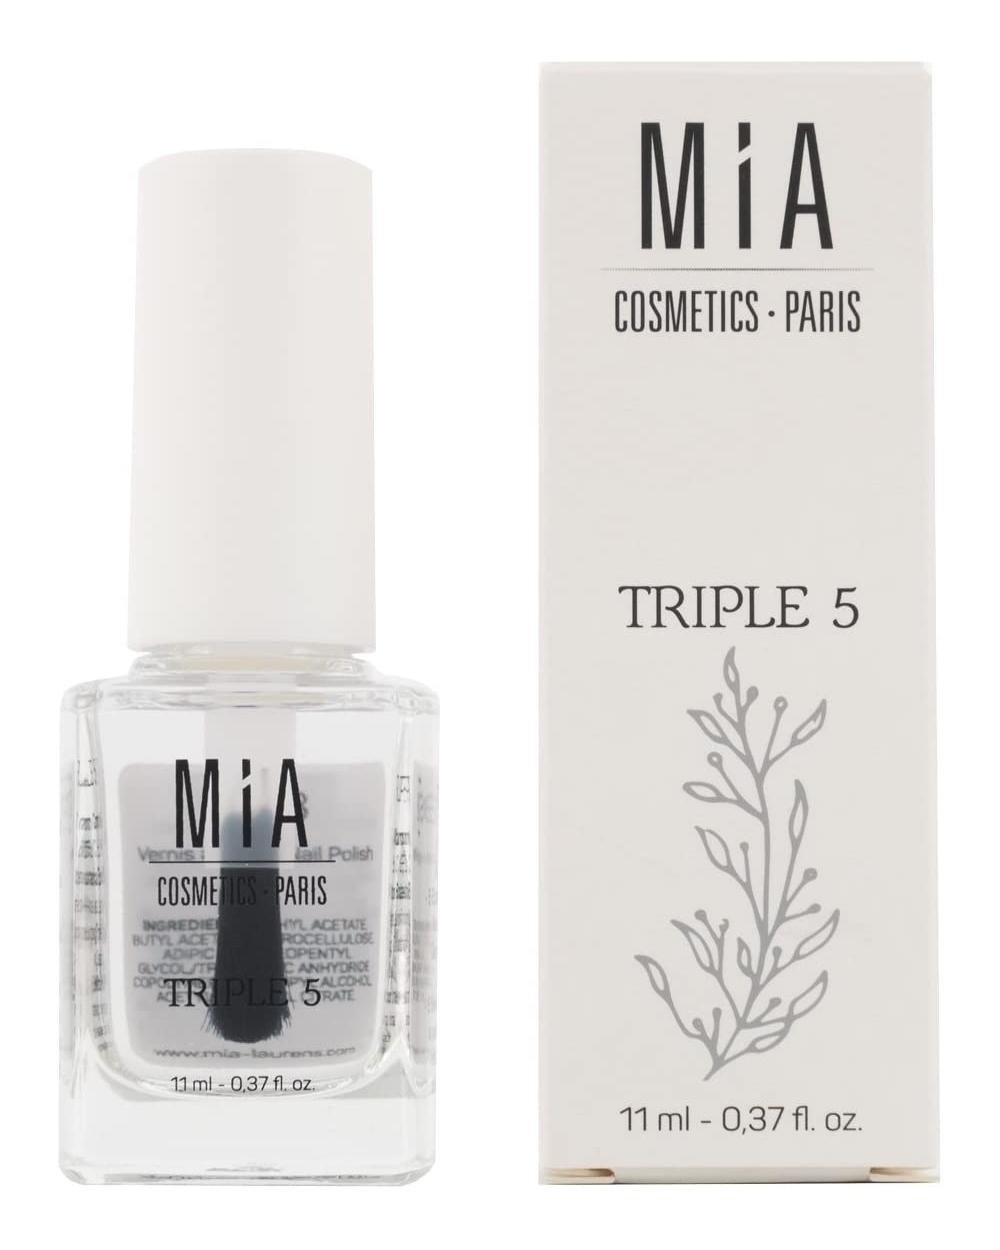 Endurecedor de uñas de Mia Cosmetics.